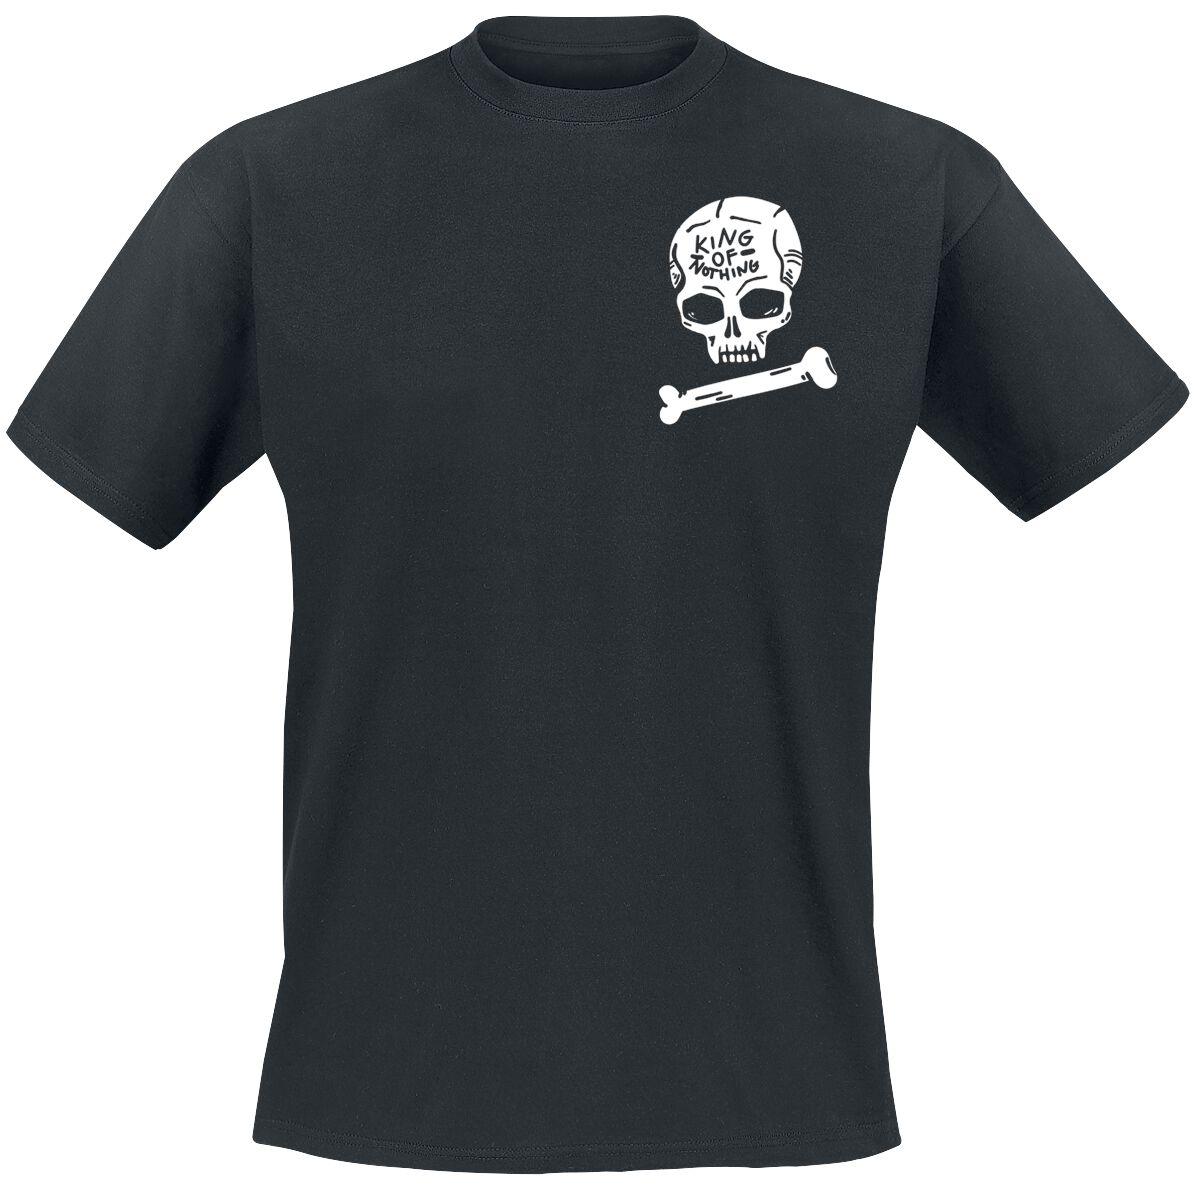 Tribe & Arrow King Of Nothing T-Shirt schwarz POD - FOTL Iconic - King Of Nothing